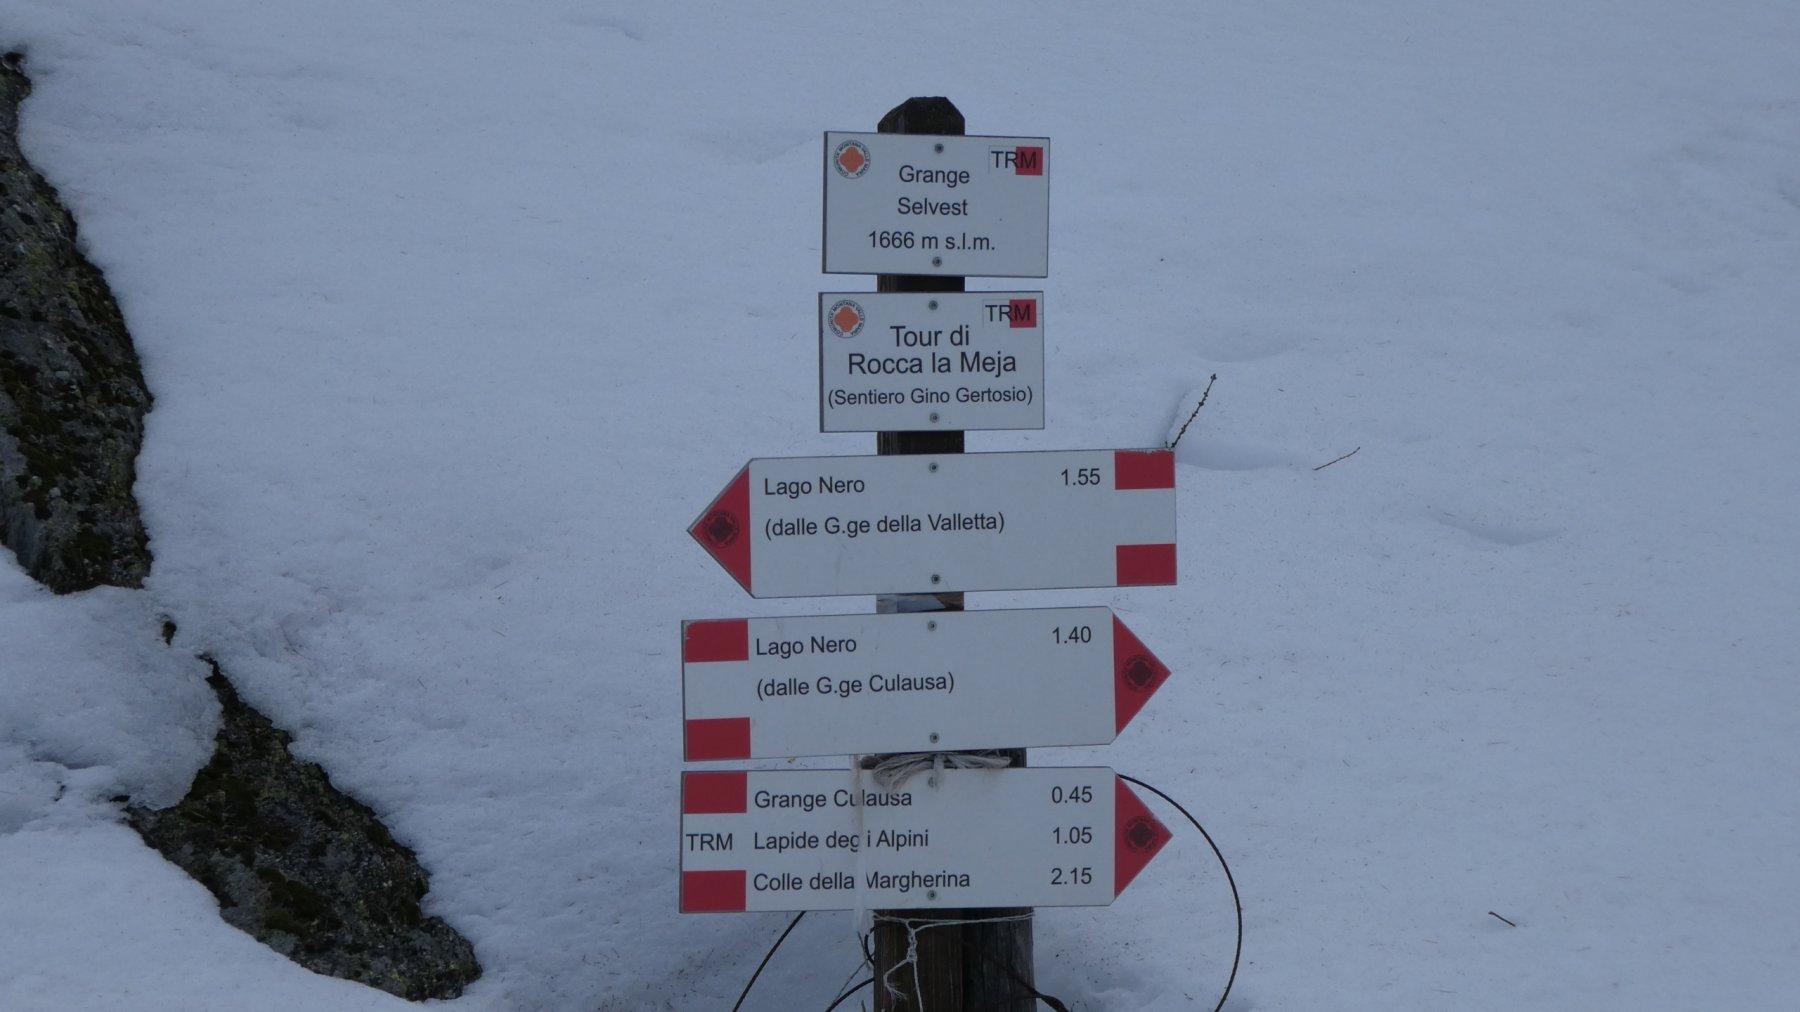 cartelli indicatori presso le Grange Selvest